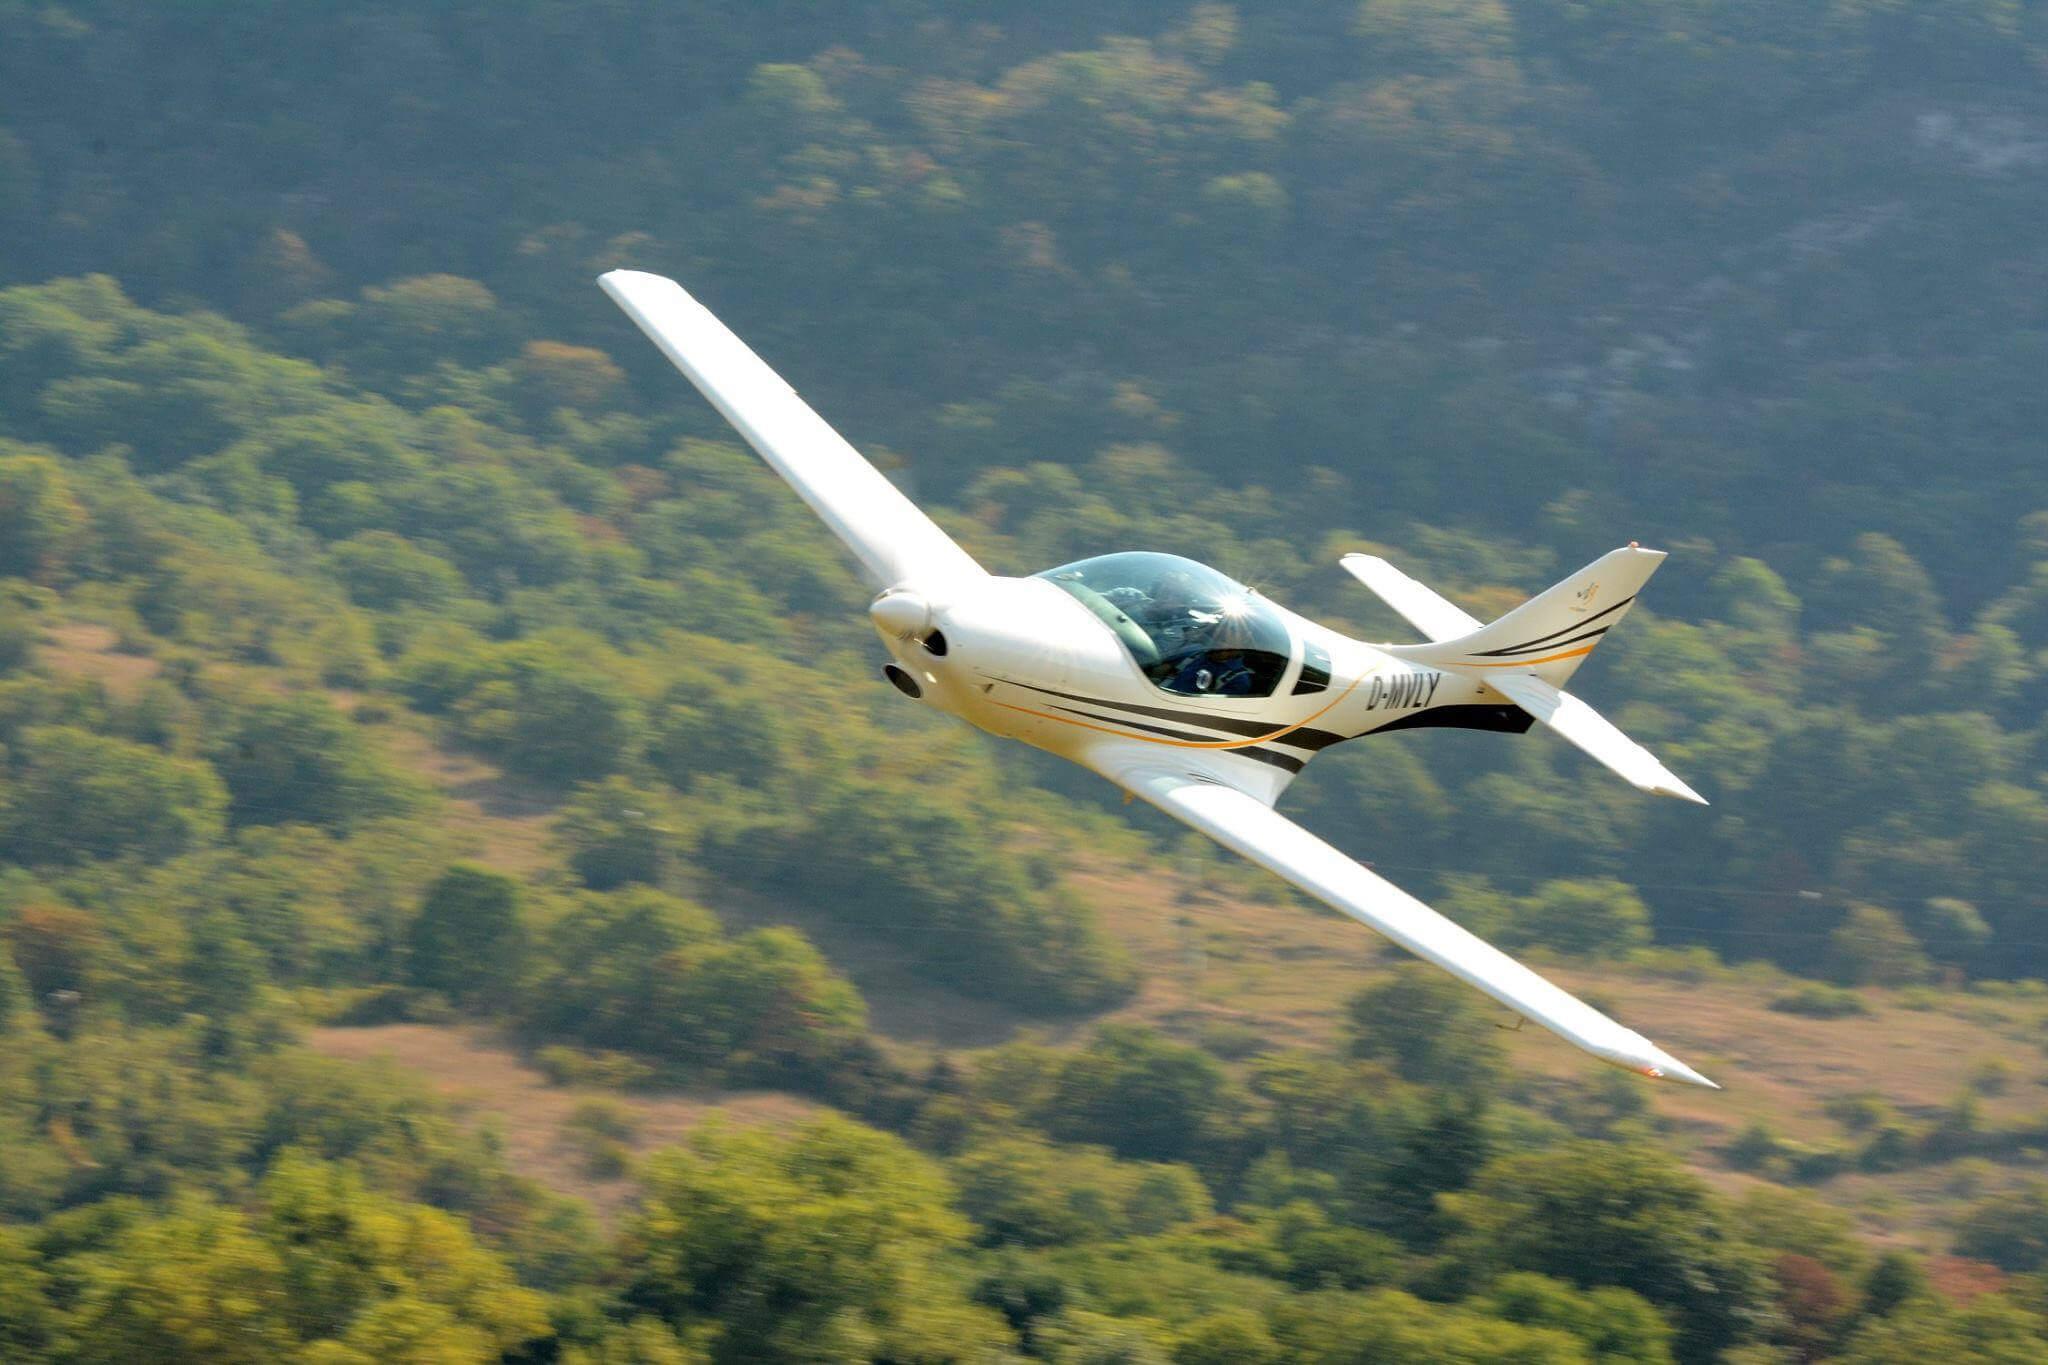 VL3 - World's fastest UL aircraft